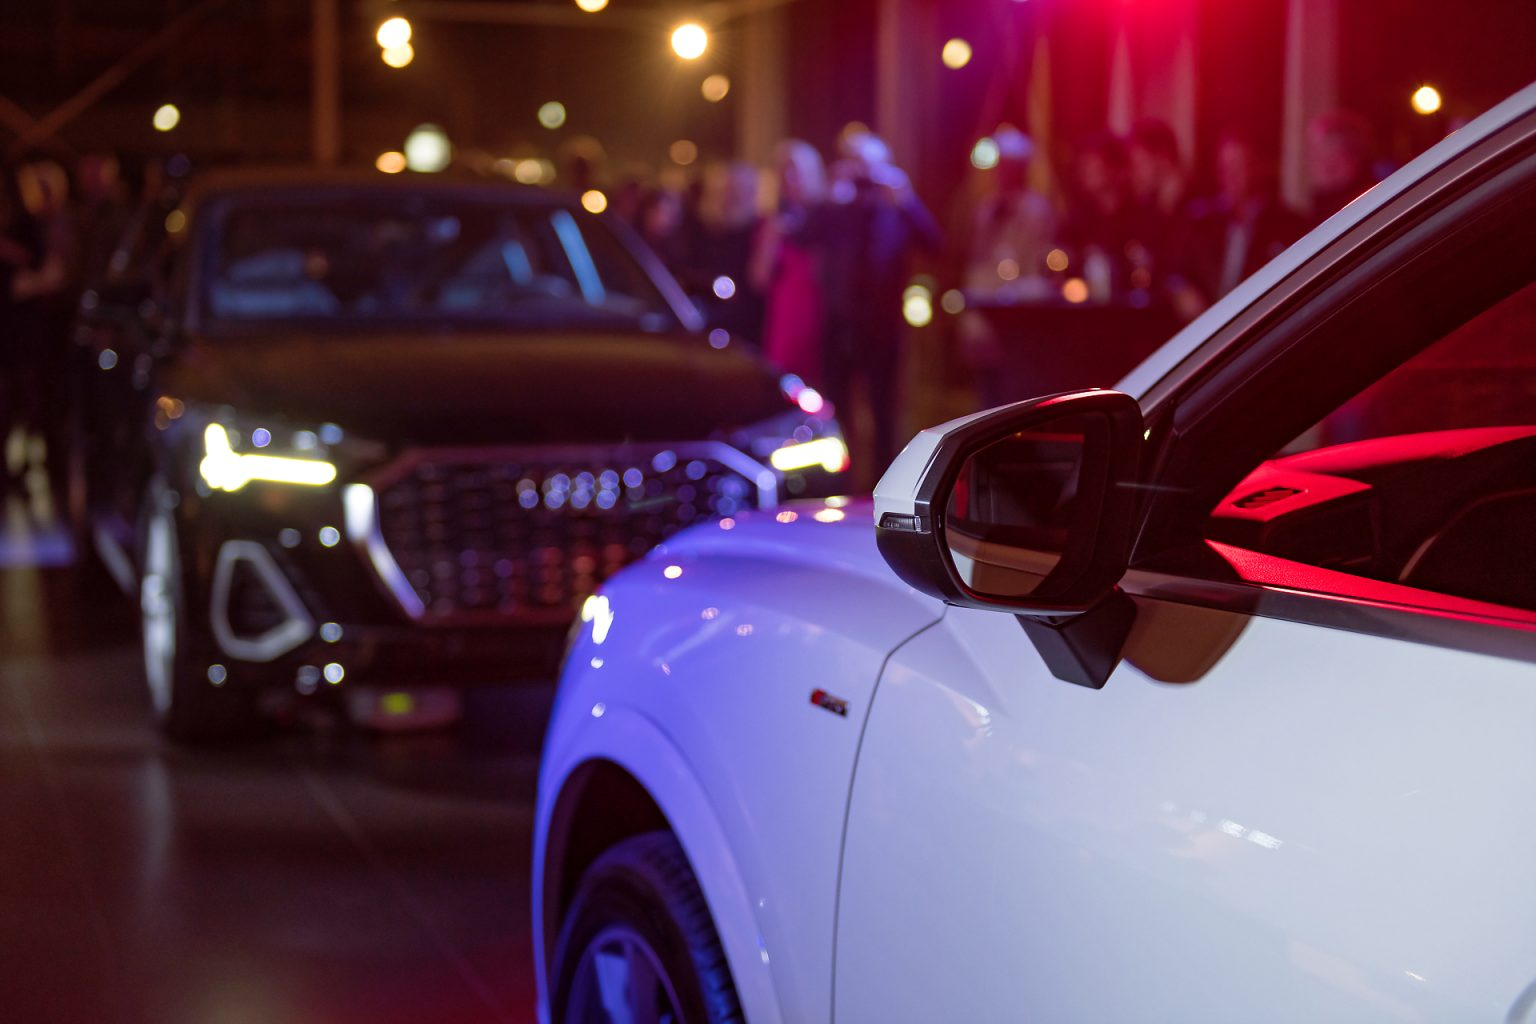 Audi Q3 Sportback lors de l'Audi Night 2019, Audi SAWA Center Waterloo par Aurore Delsoir photographe corporate